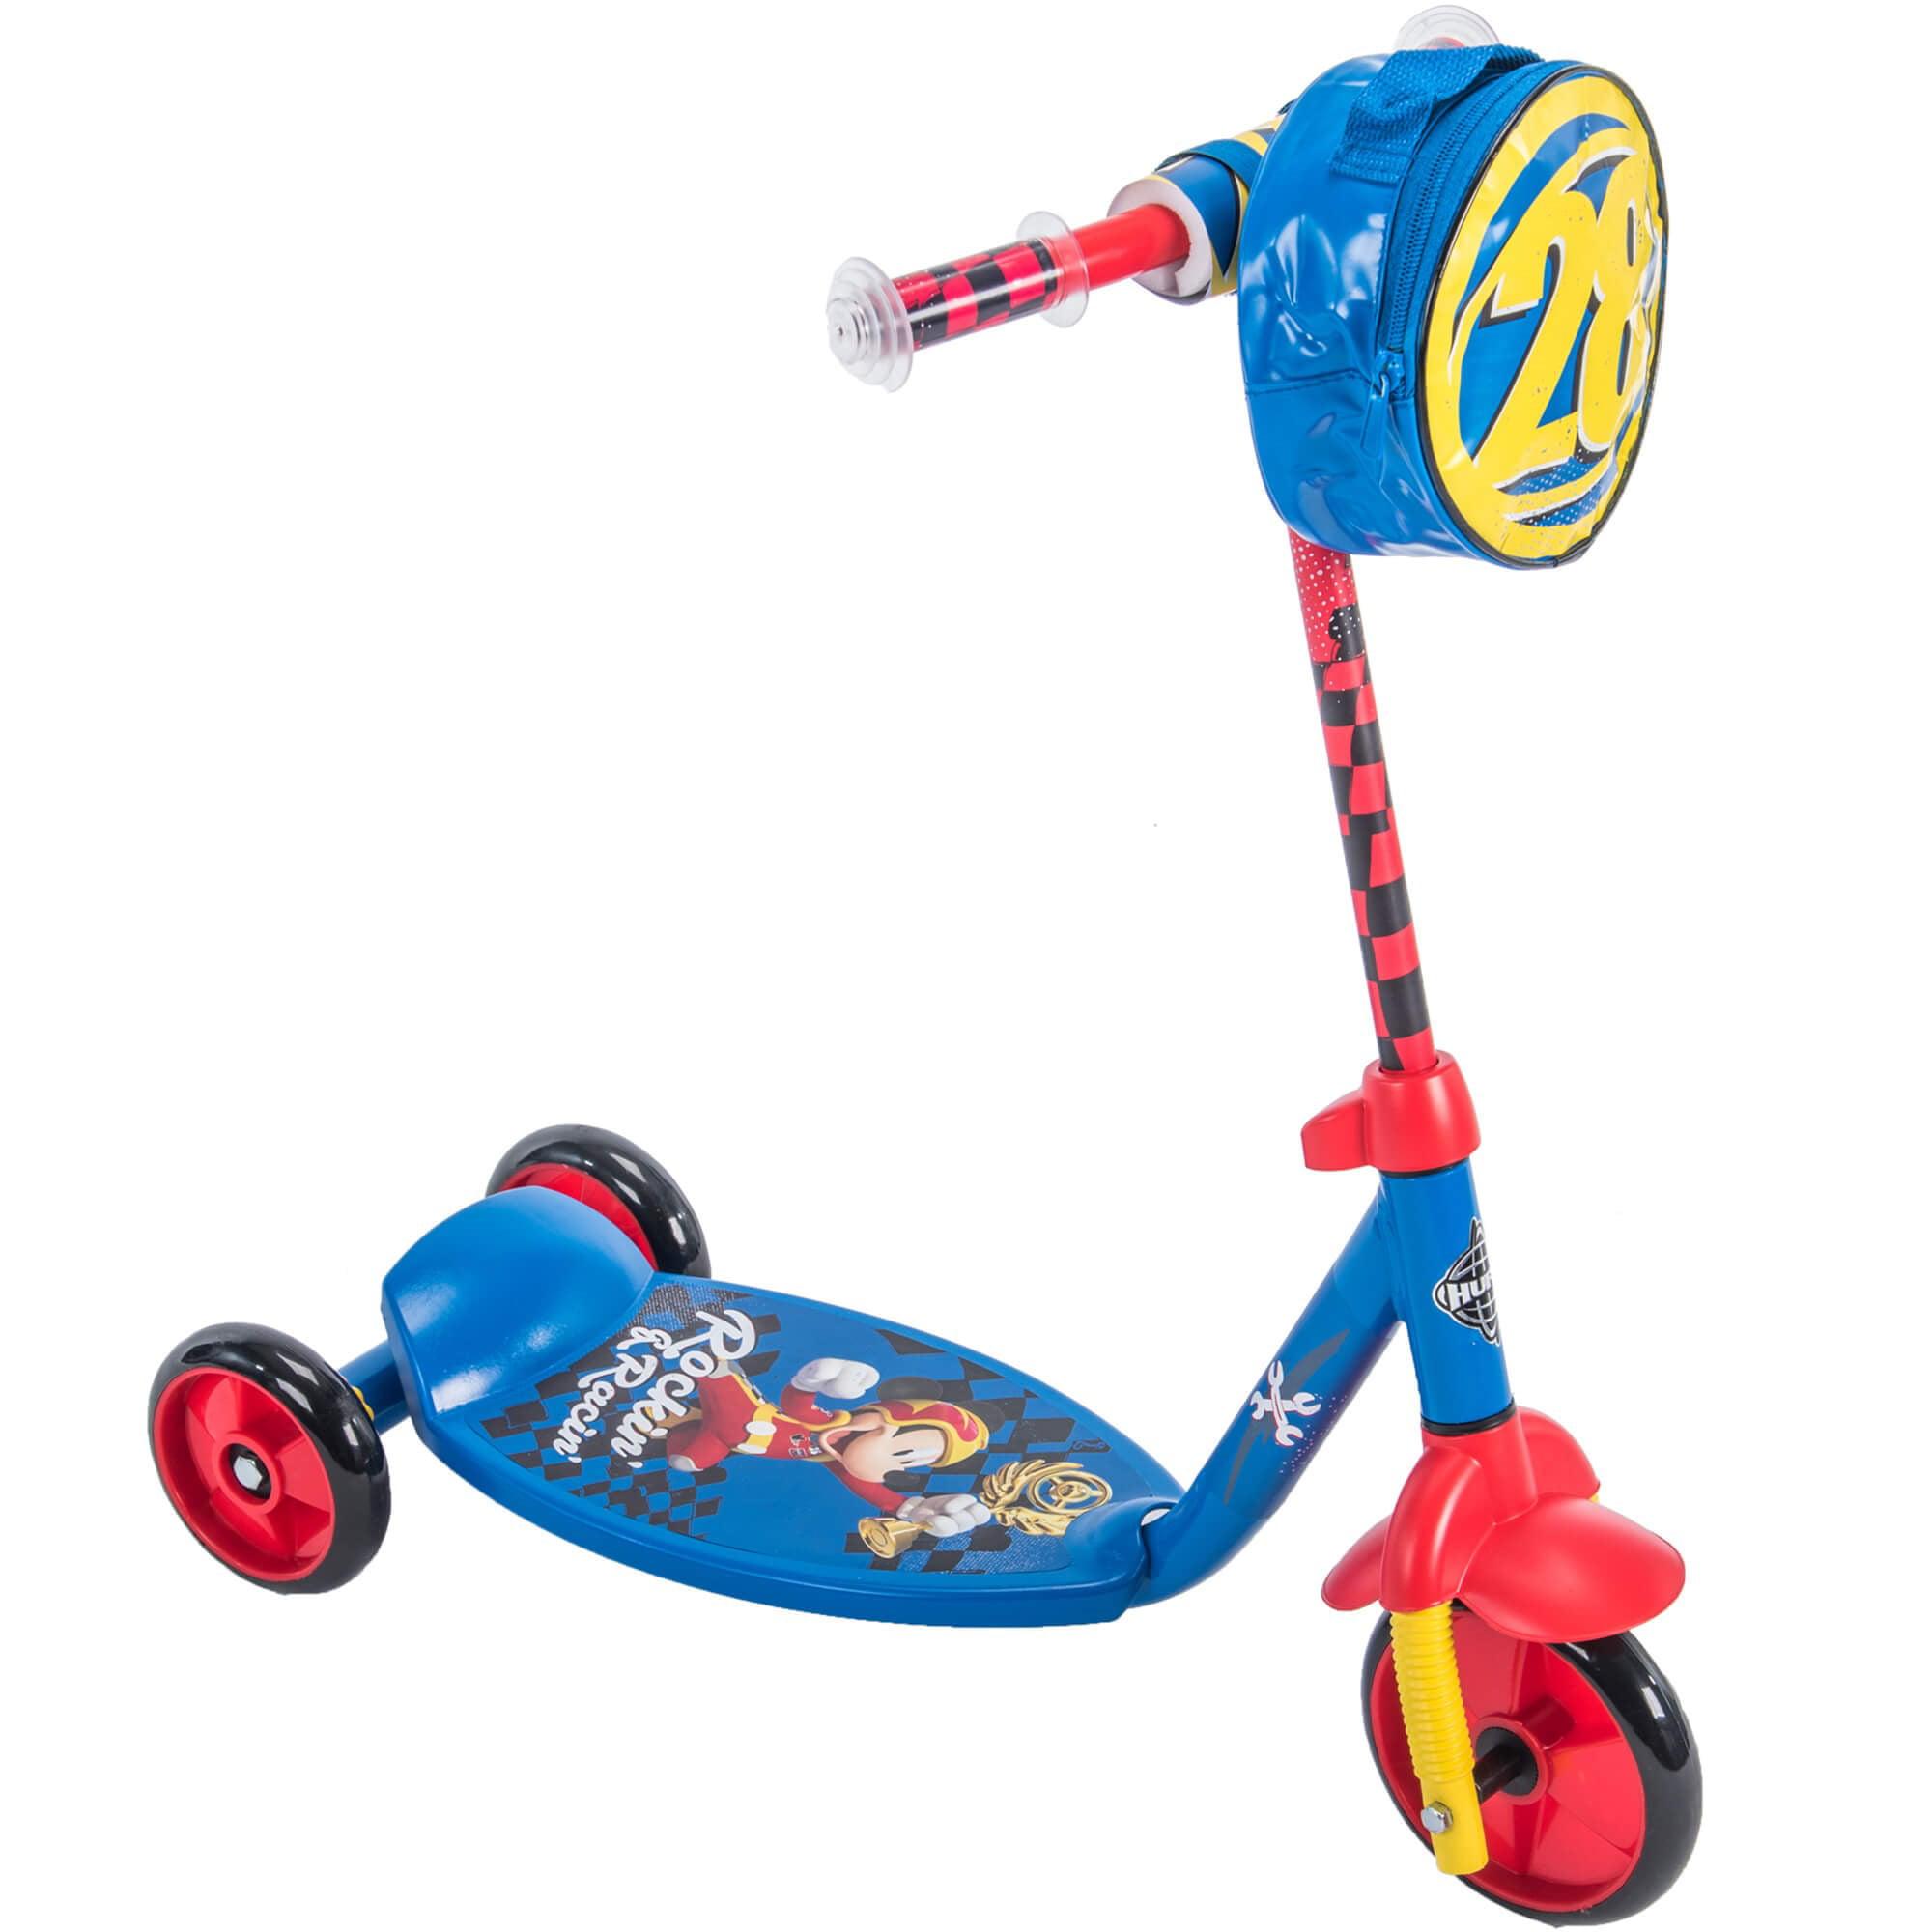 Disney Mickey Mouse Boys' 3-Wheel Preschool Scooter, by Huffy by Disney